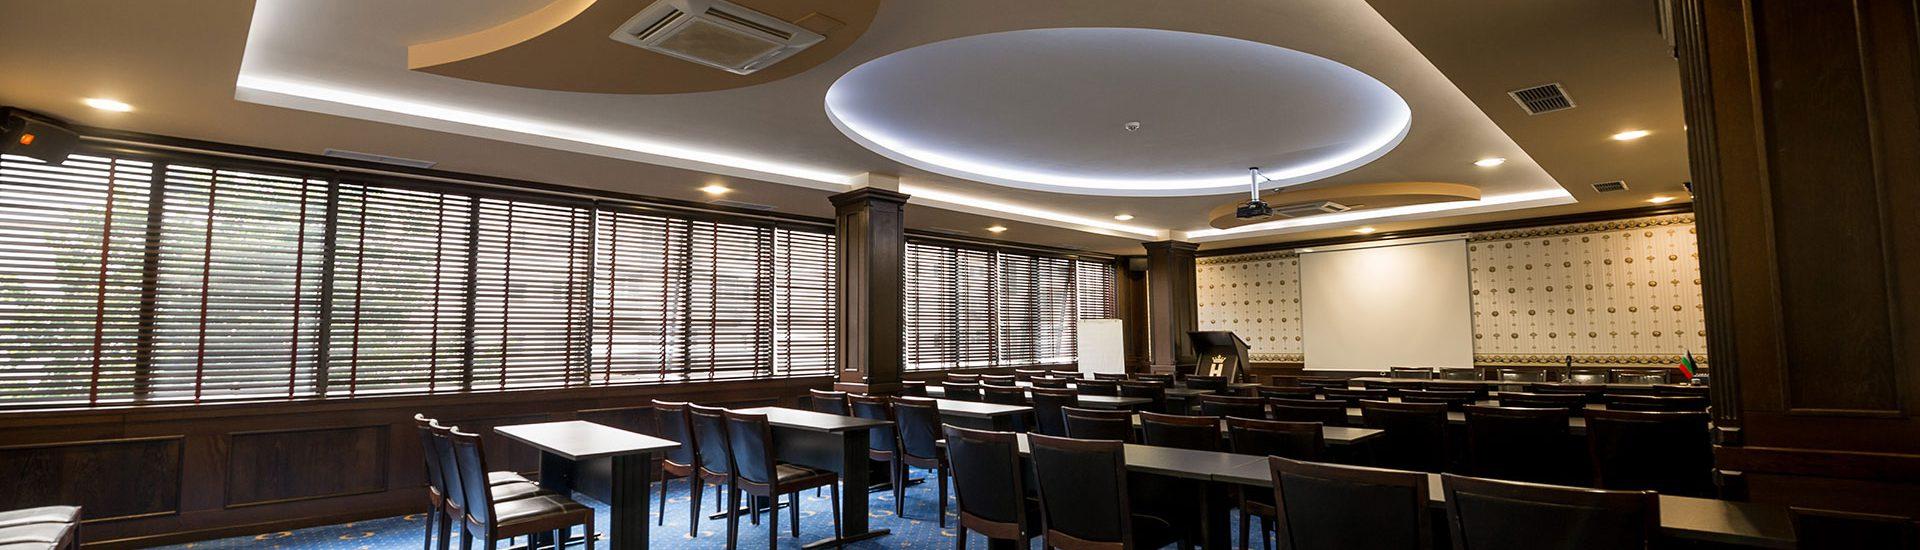 Grand Hotel Hebar - Conference Hall